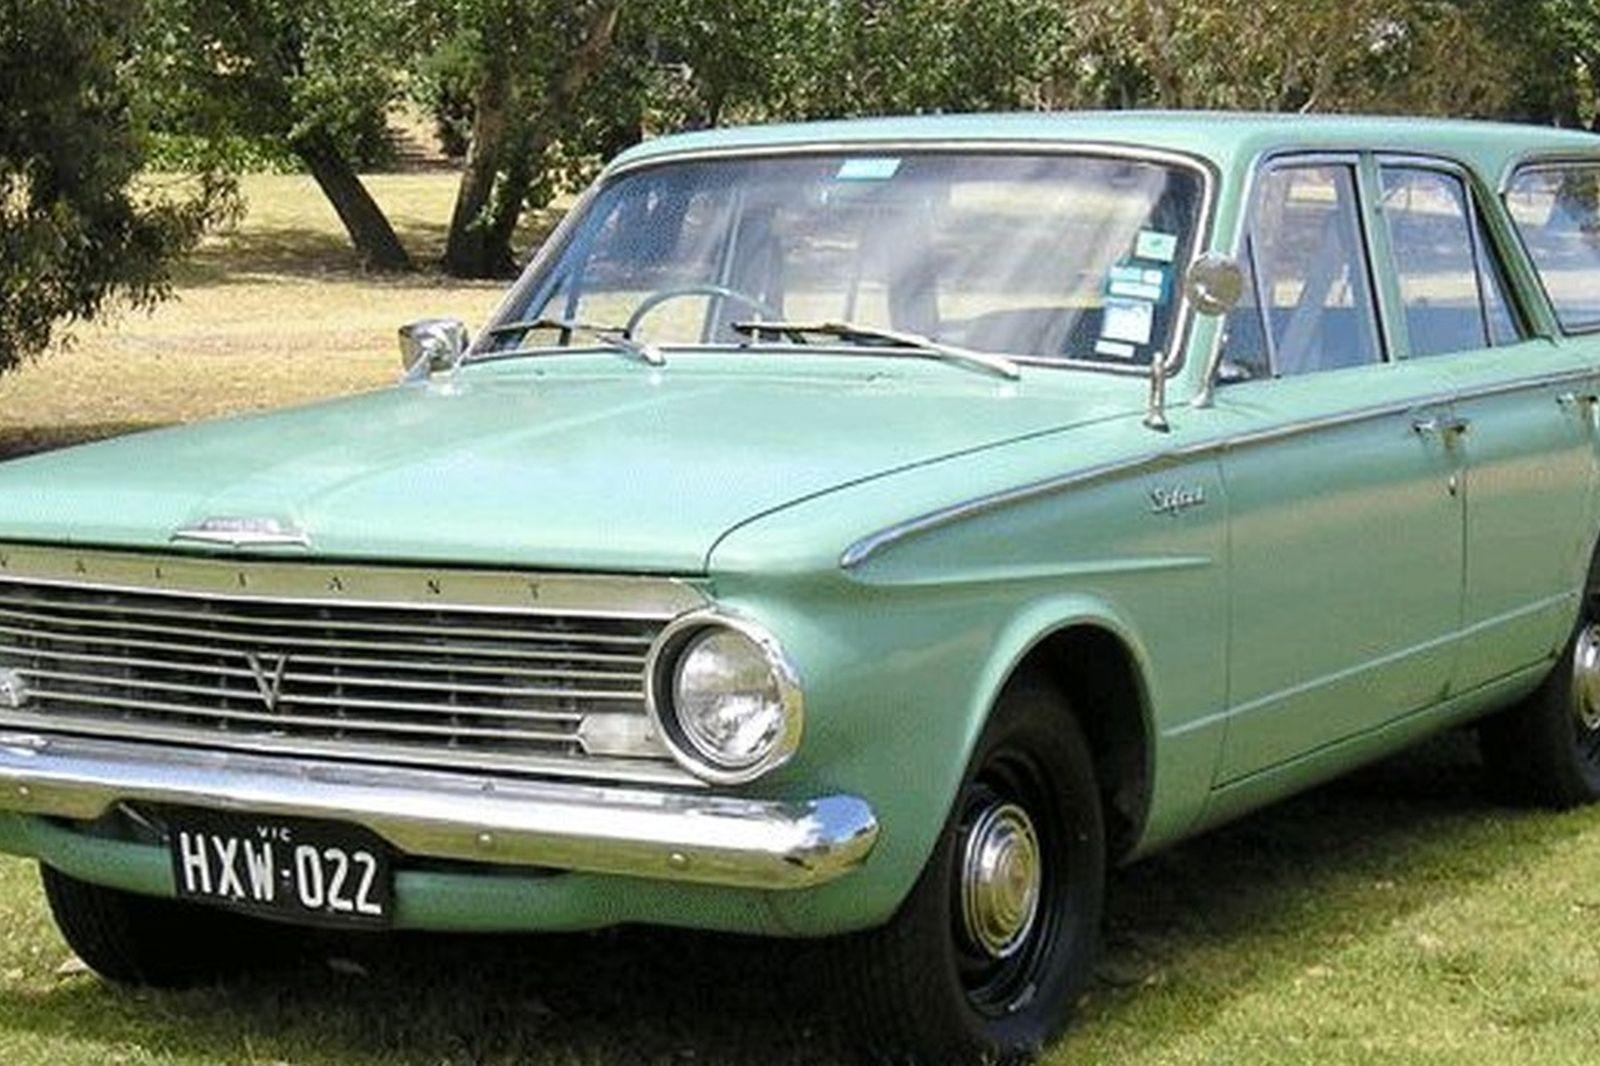 sold chrysler valiant ap5 safari station wagon auctions